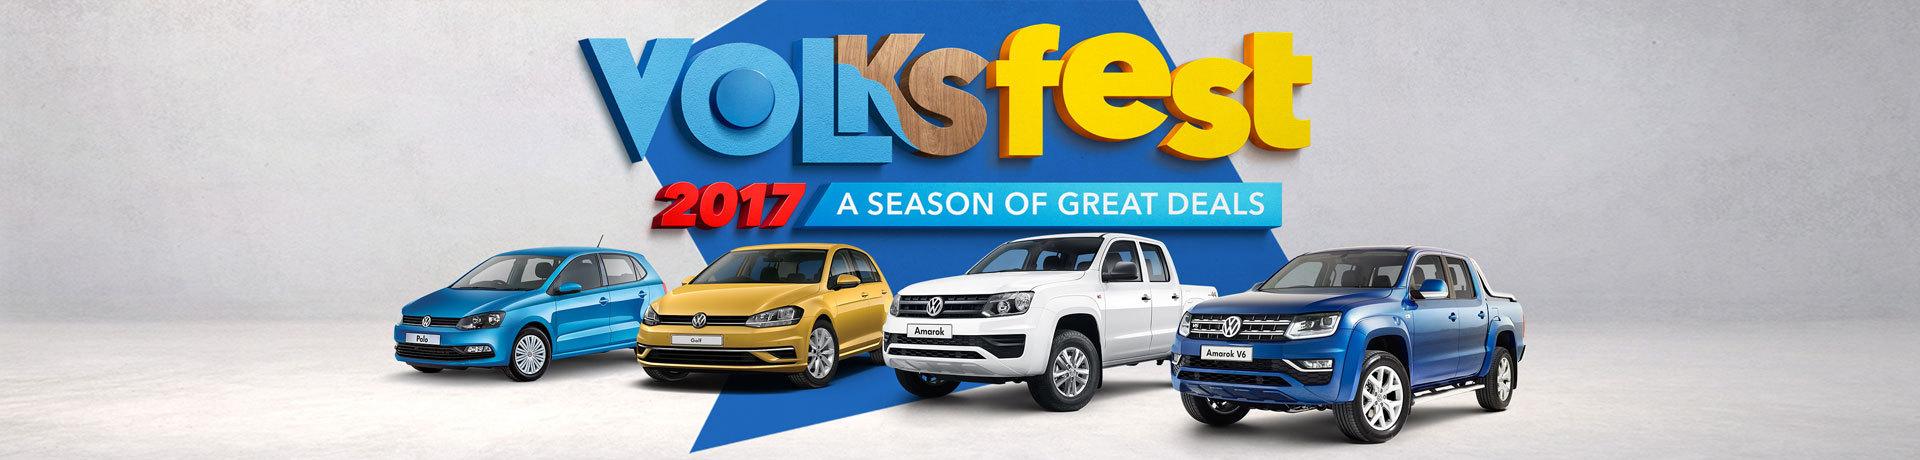 Volkswagen - National Offer - Volksfest; 2017 A Season of Great Deals